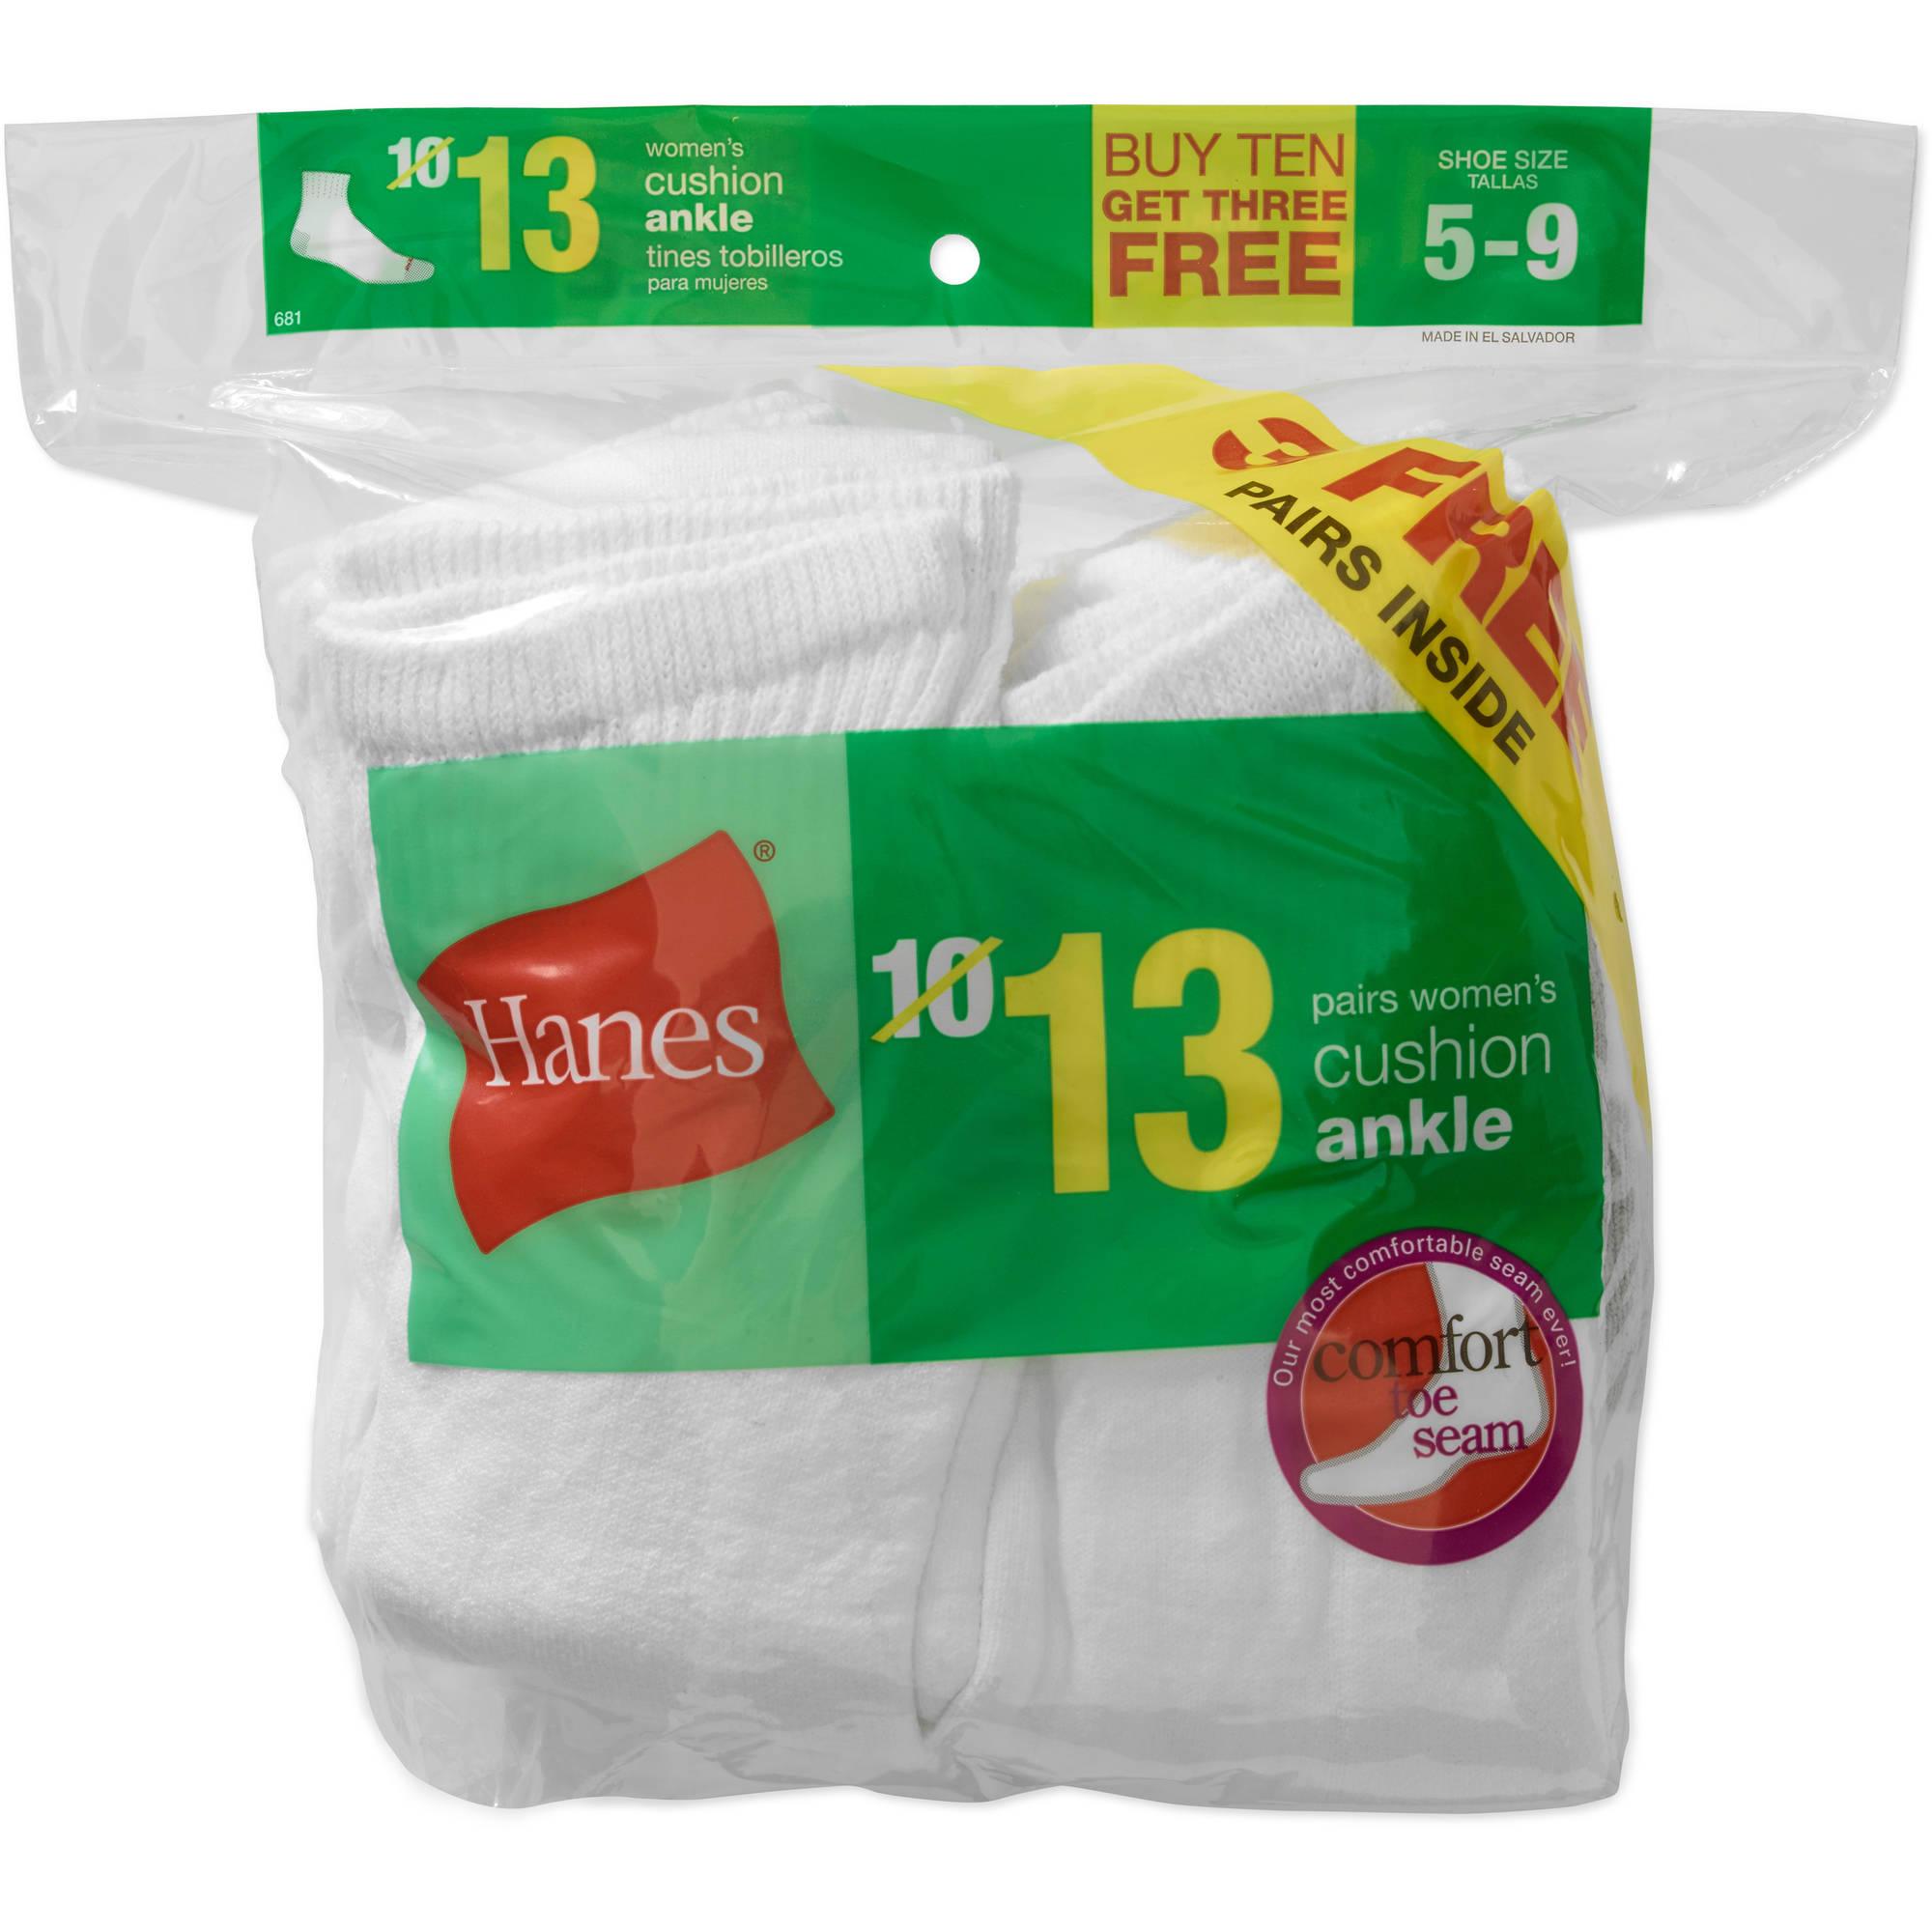 Hanes Ladies ComfortBlend Half Cushion Ankle Socks, 10 Pack + 3 Free